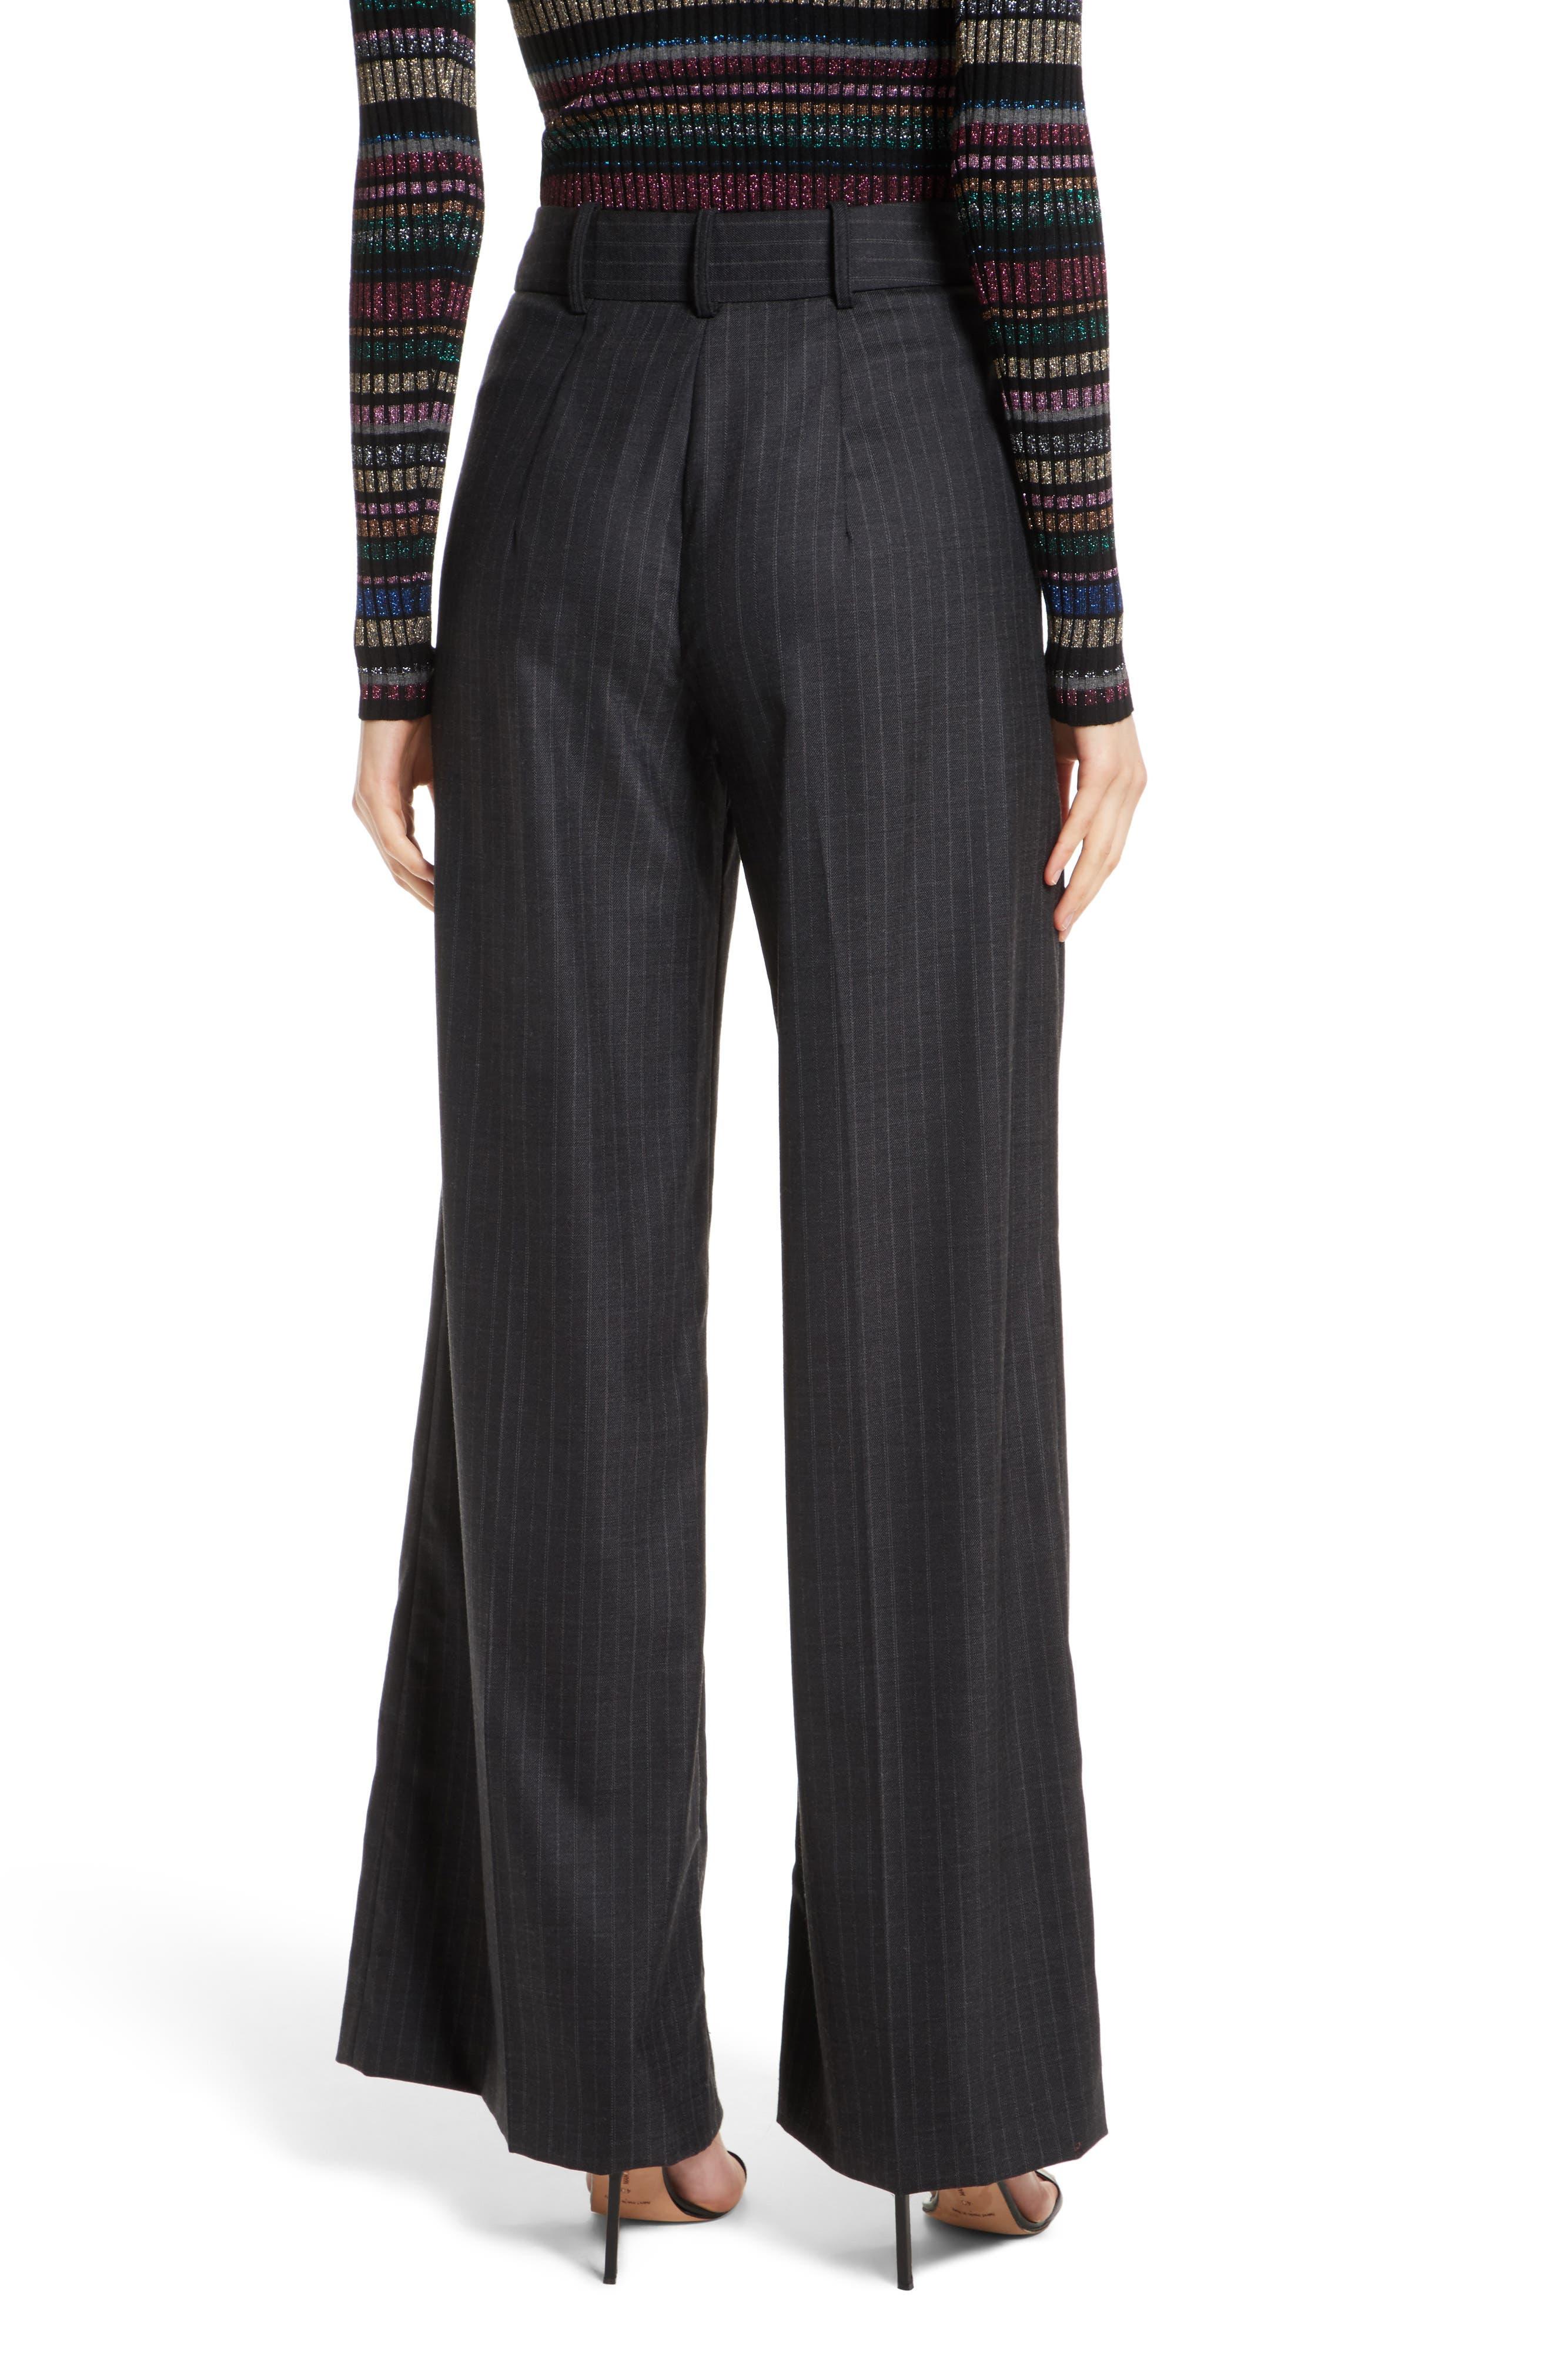 Sia Pinstripe Italian Stretch Wool Trousers,                             Alternate thumbnail 3, color,                             Grey Stripe